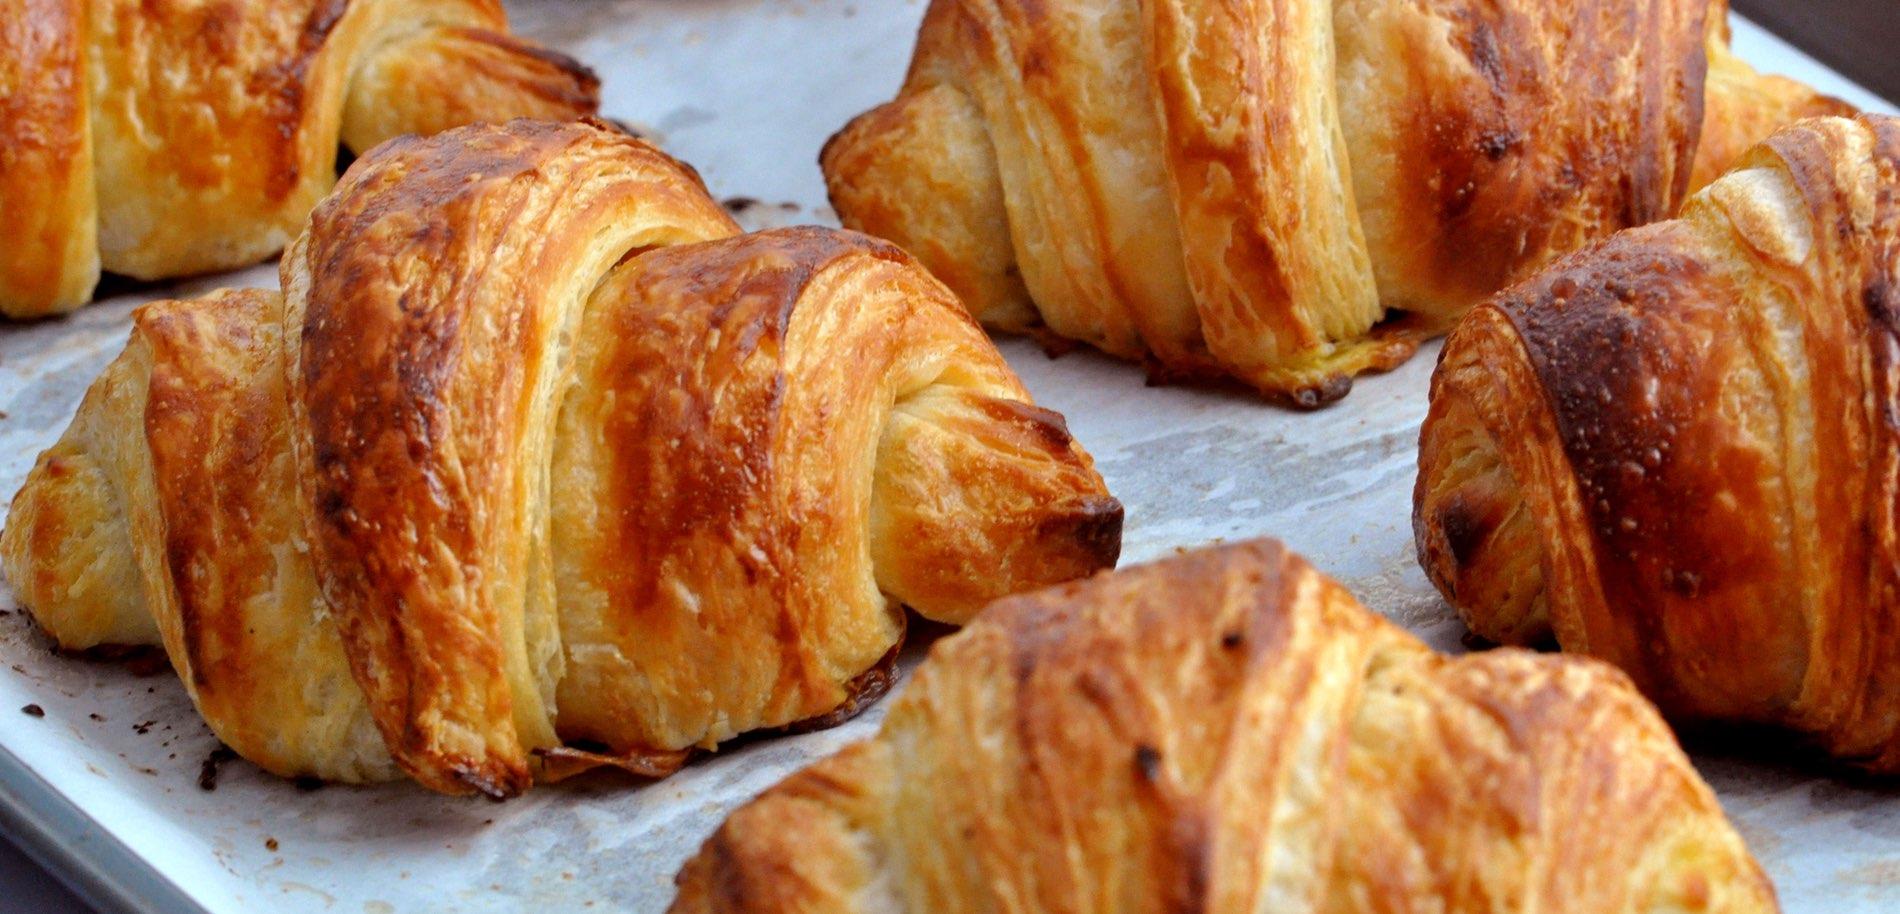 croissants@2x.jpg